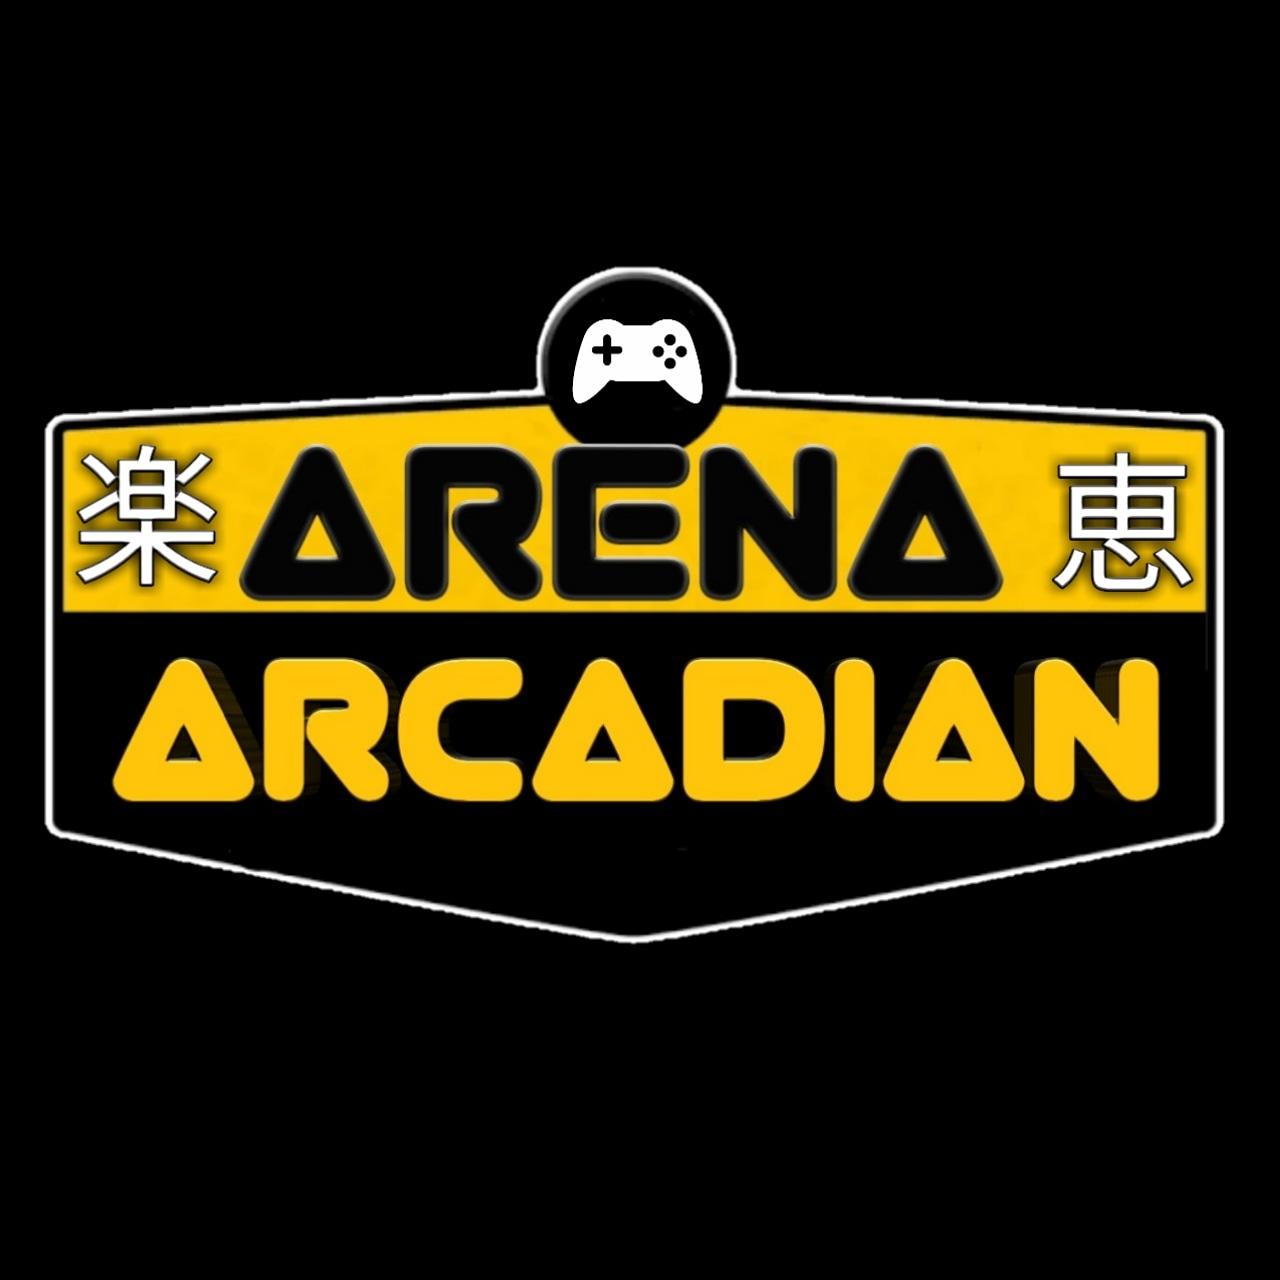 ARENA ARCADIAN